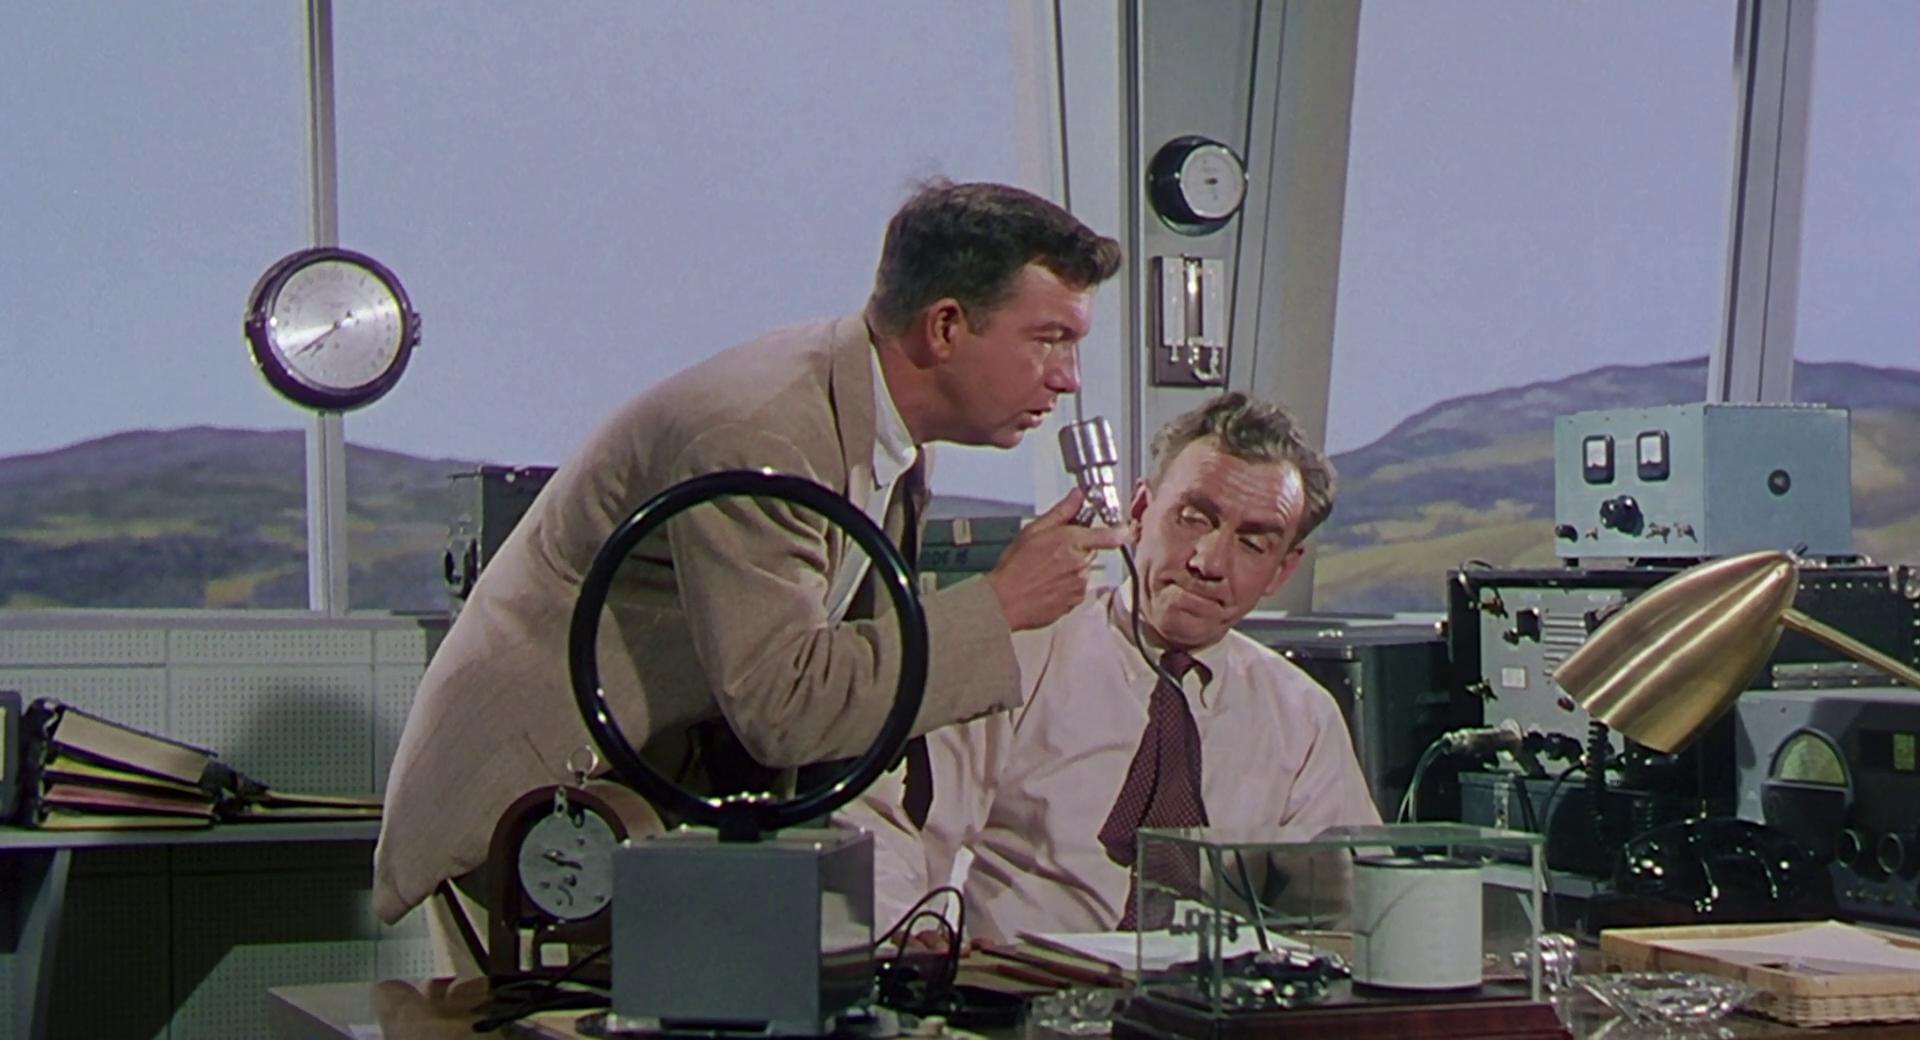 悠悠MP4_MP4电影下载_飞碟征空/孤独的地球 This.Island.Earth.1955.1080p.BluRay.x264-USURY 6.56GB